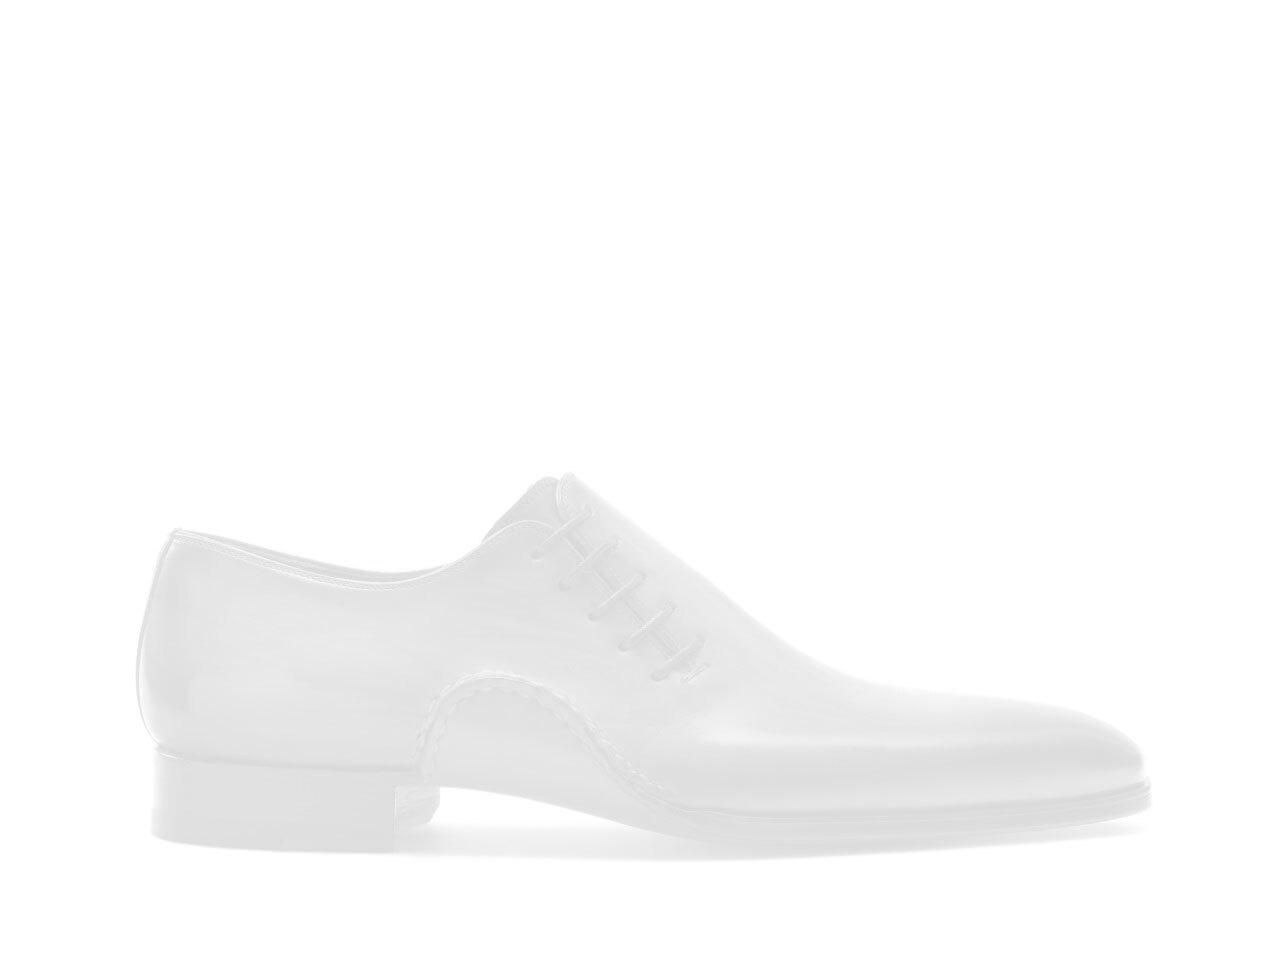 Pair of the Magnanni Altamira Brown Men's Double Monk Strap Shoes